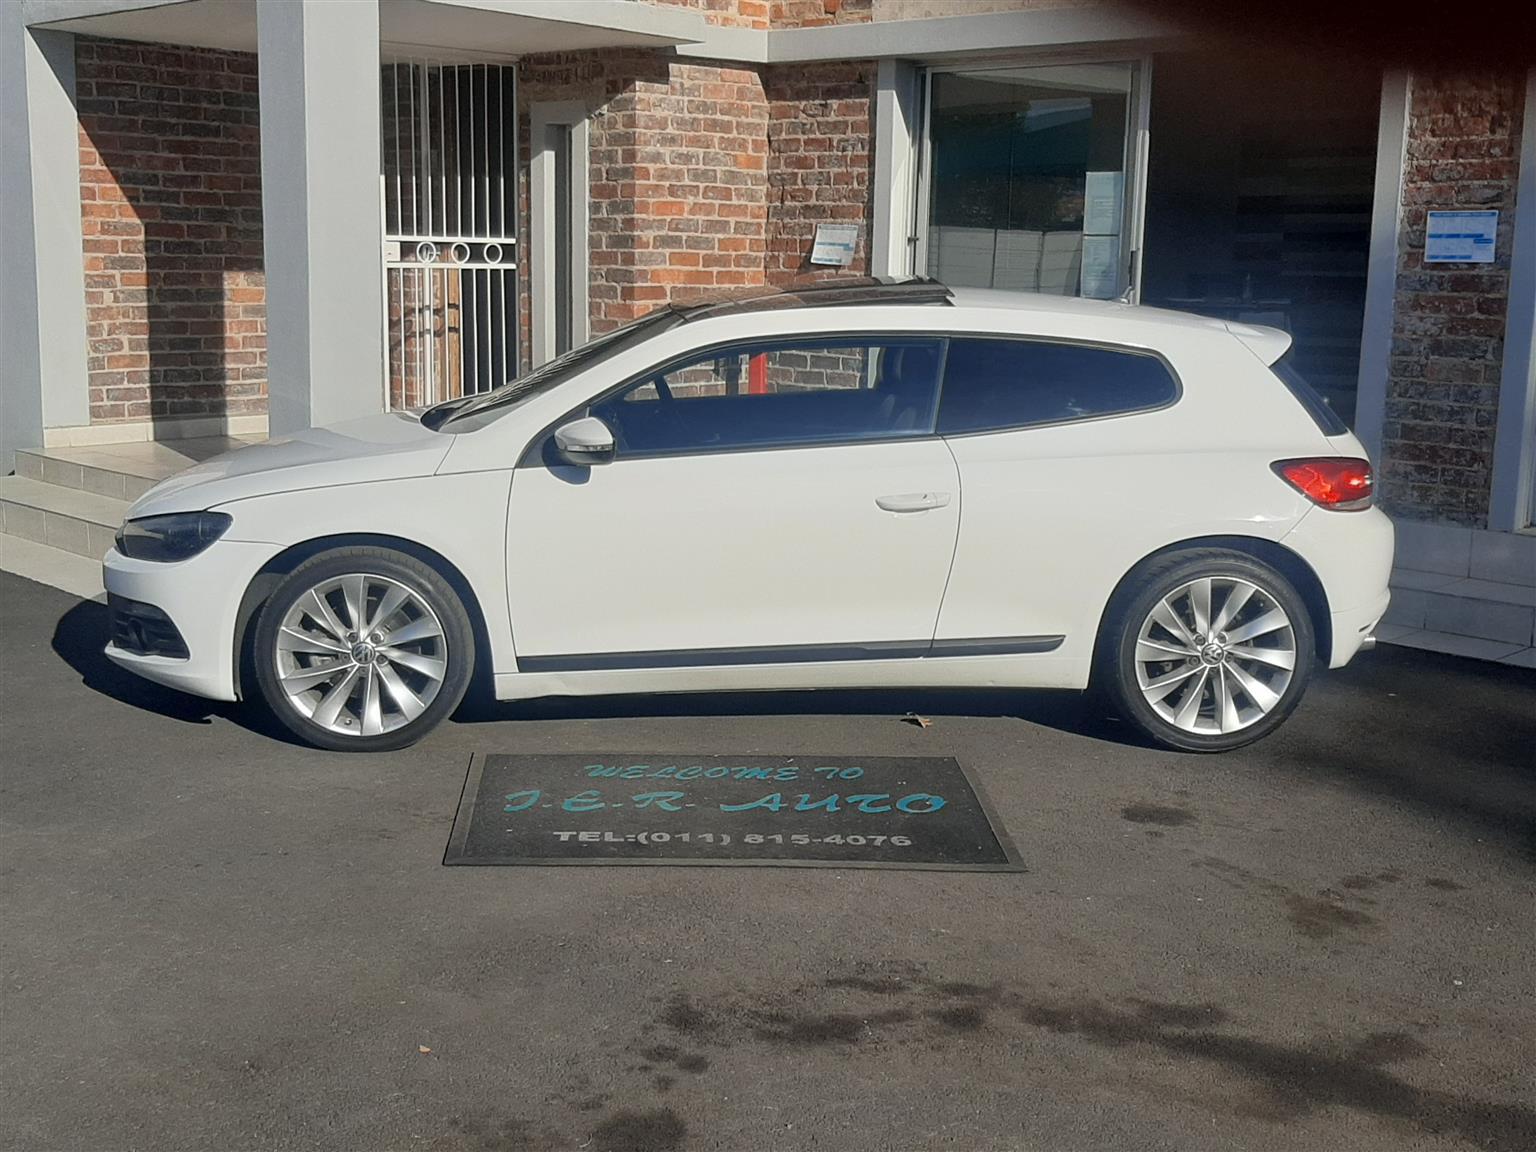 VW Sicrocco 2.0Tsi DSG